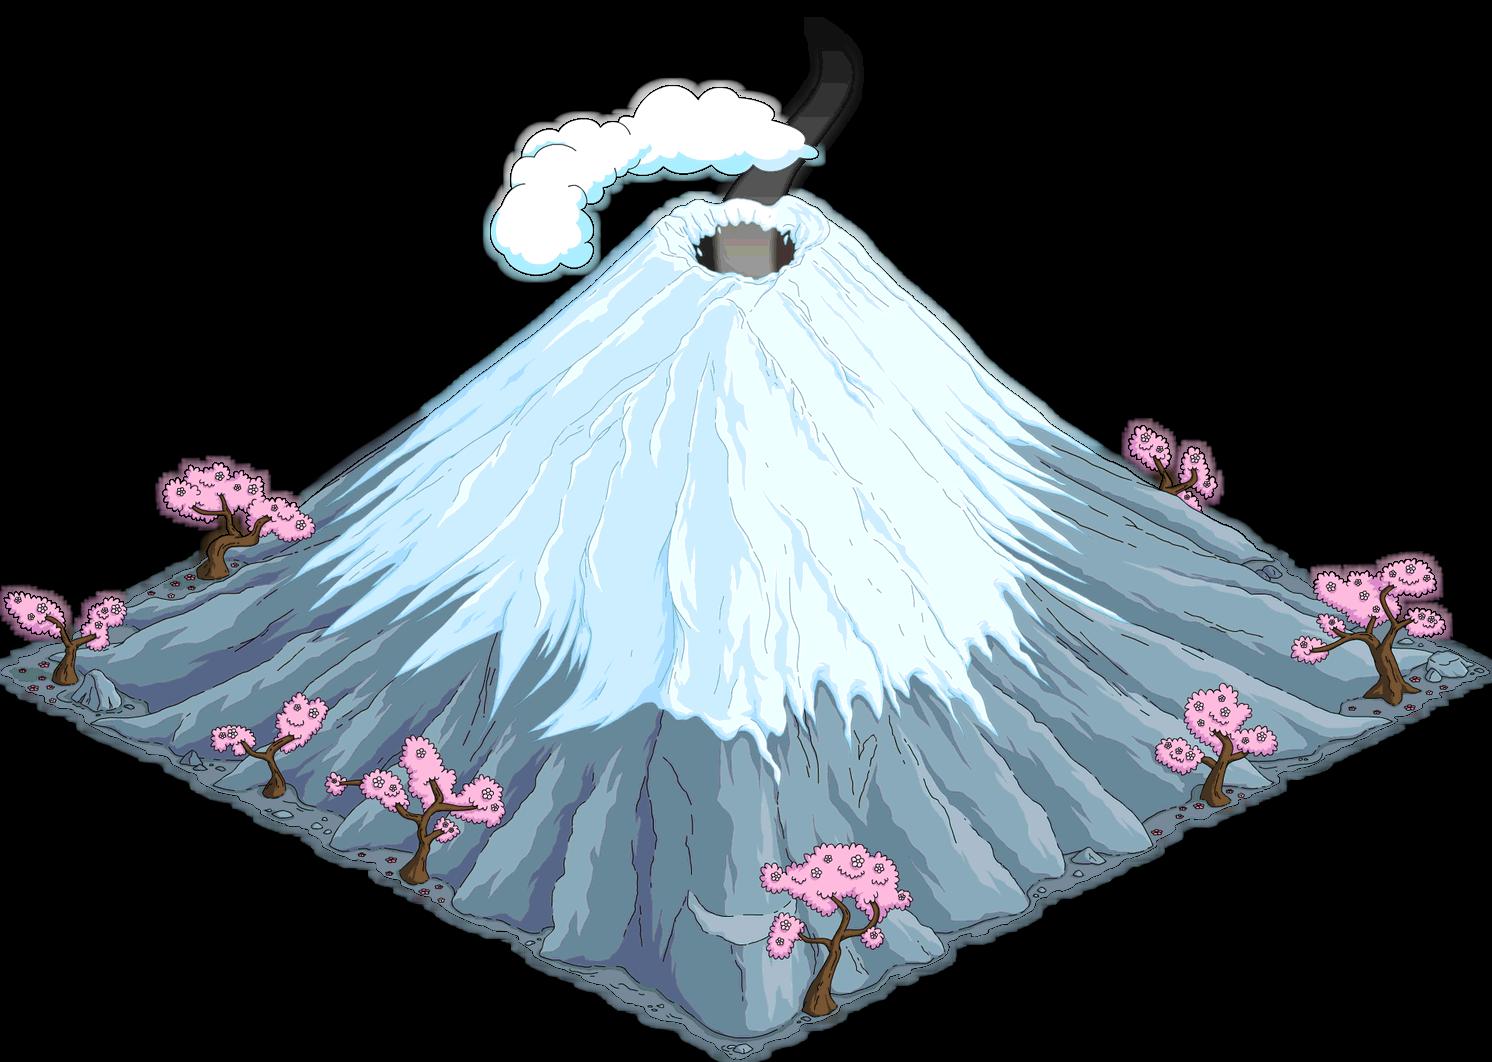 Mount Fuji.png